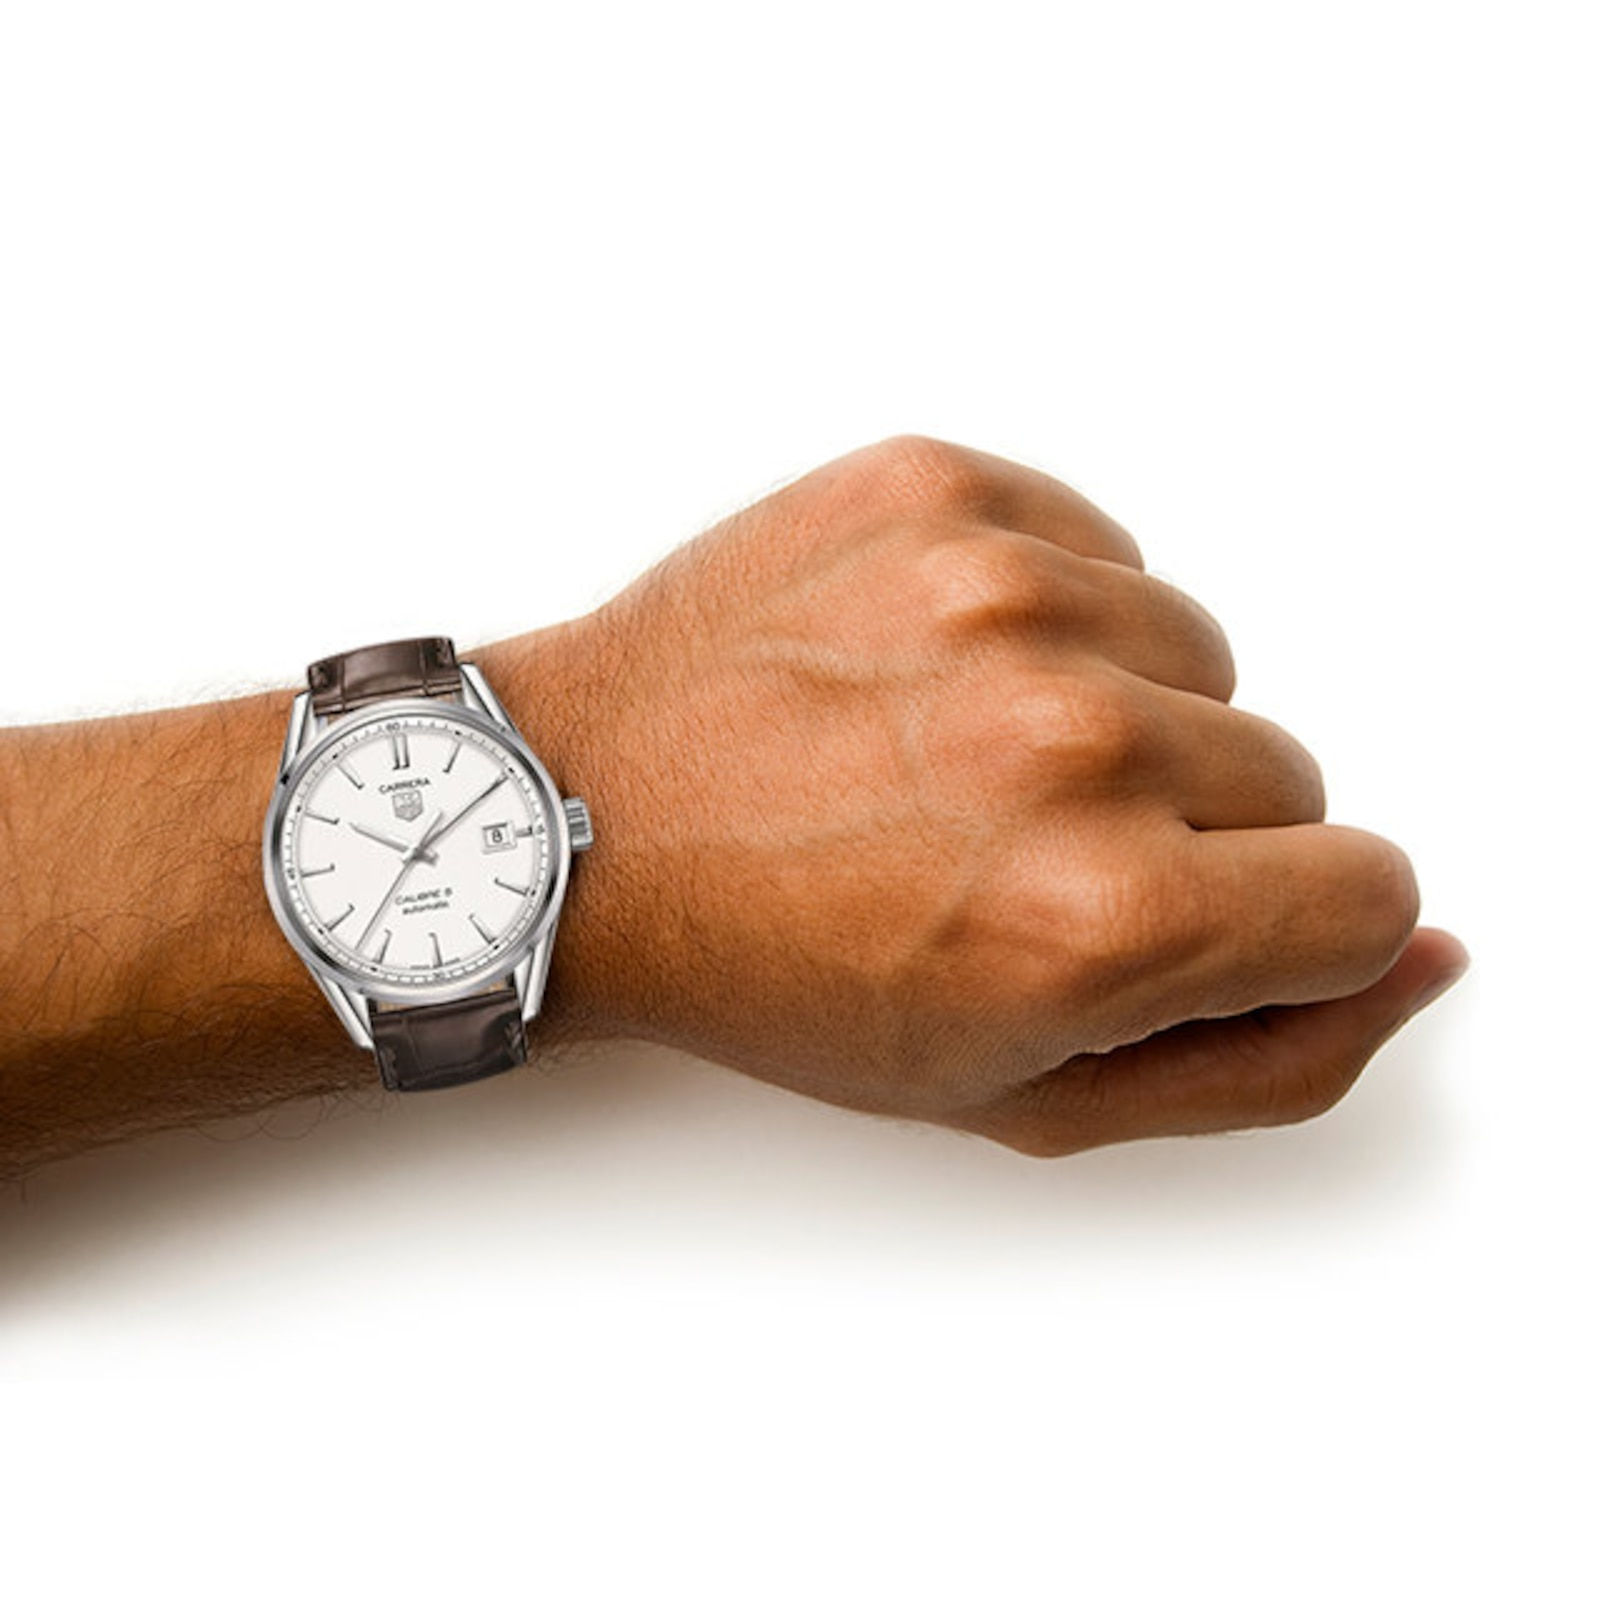 TAG Heuer Carrera Calibre 5 39mm Automatic Mens Watch